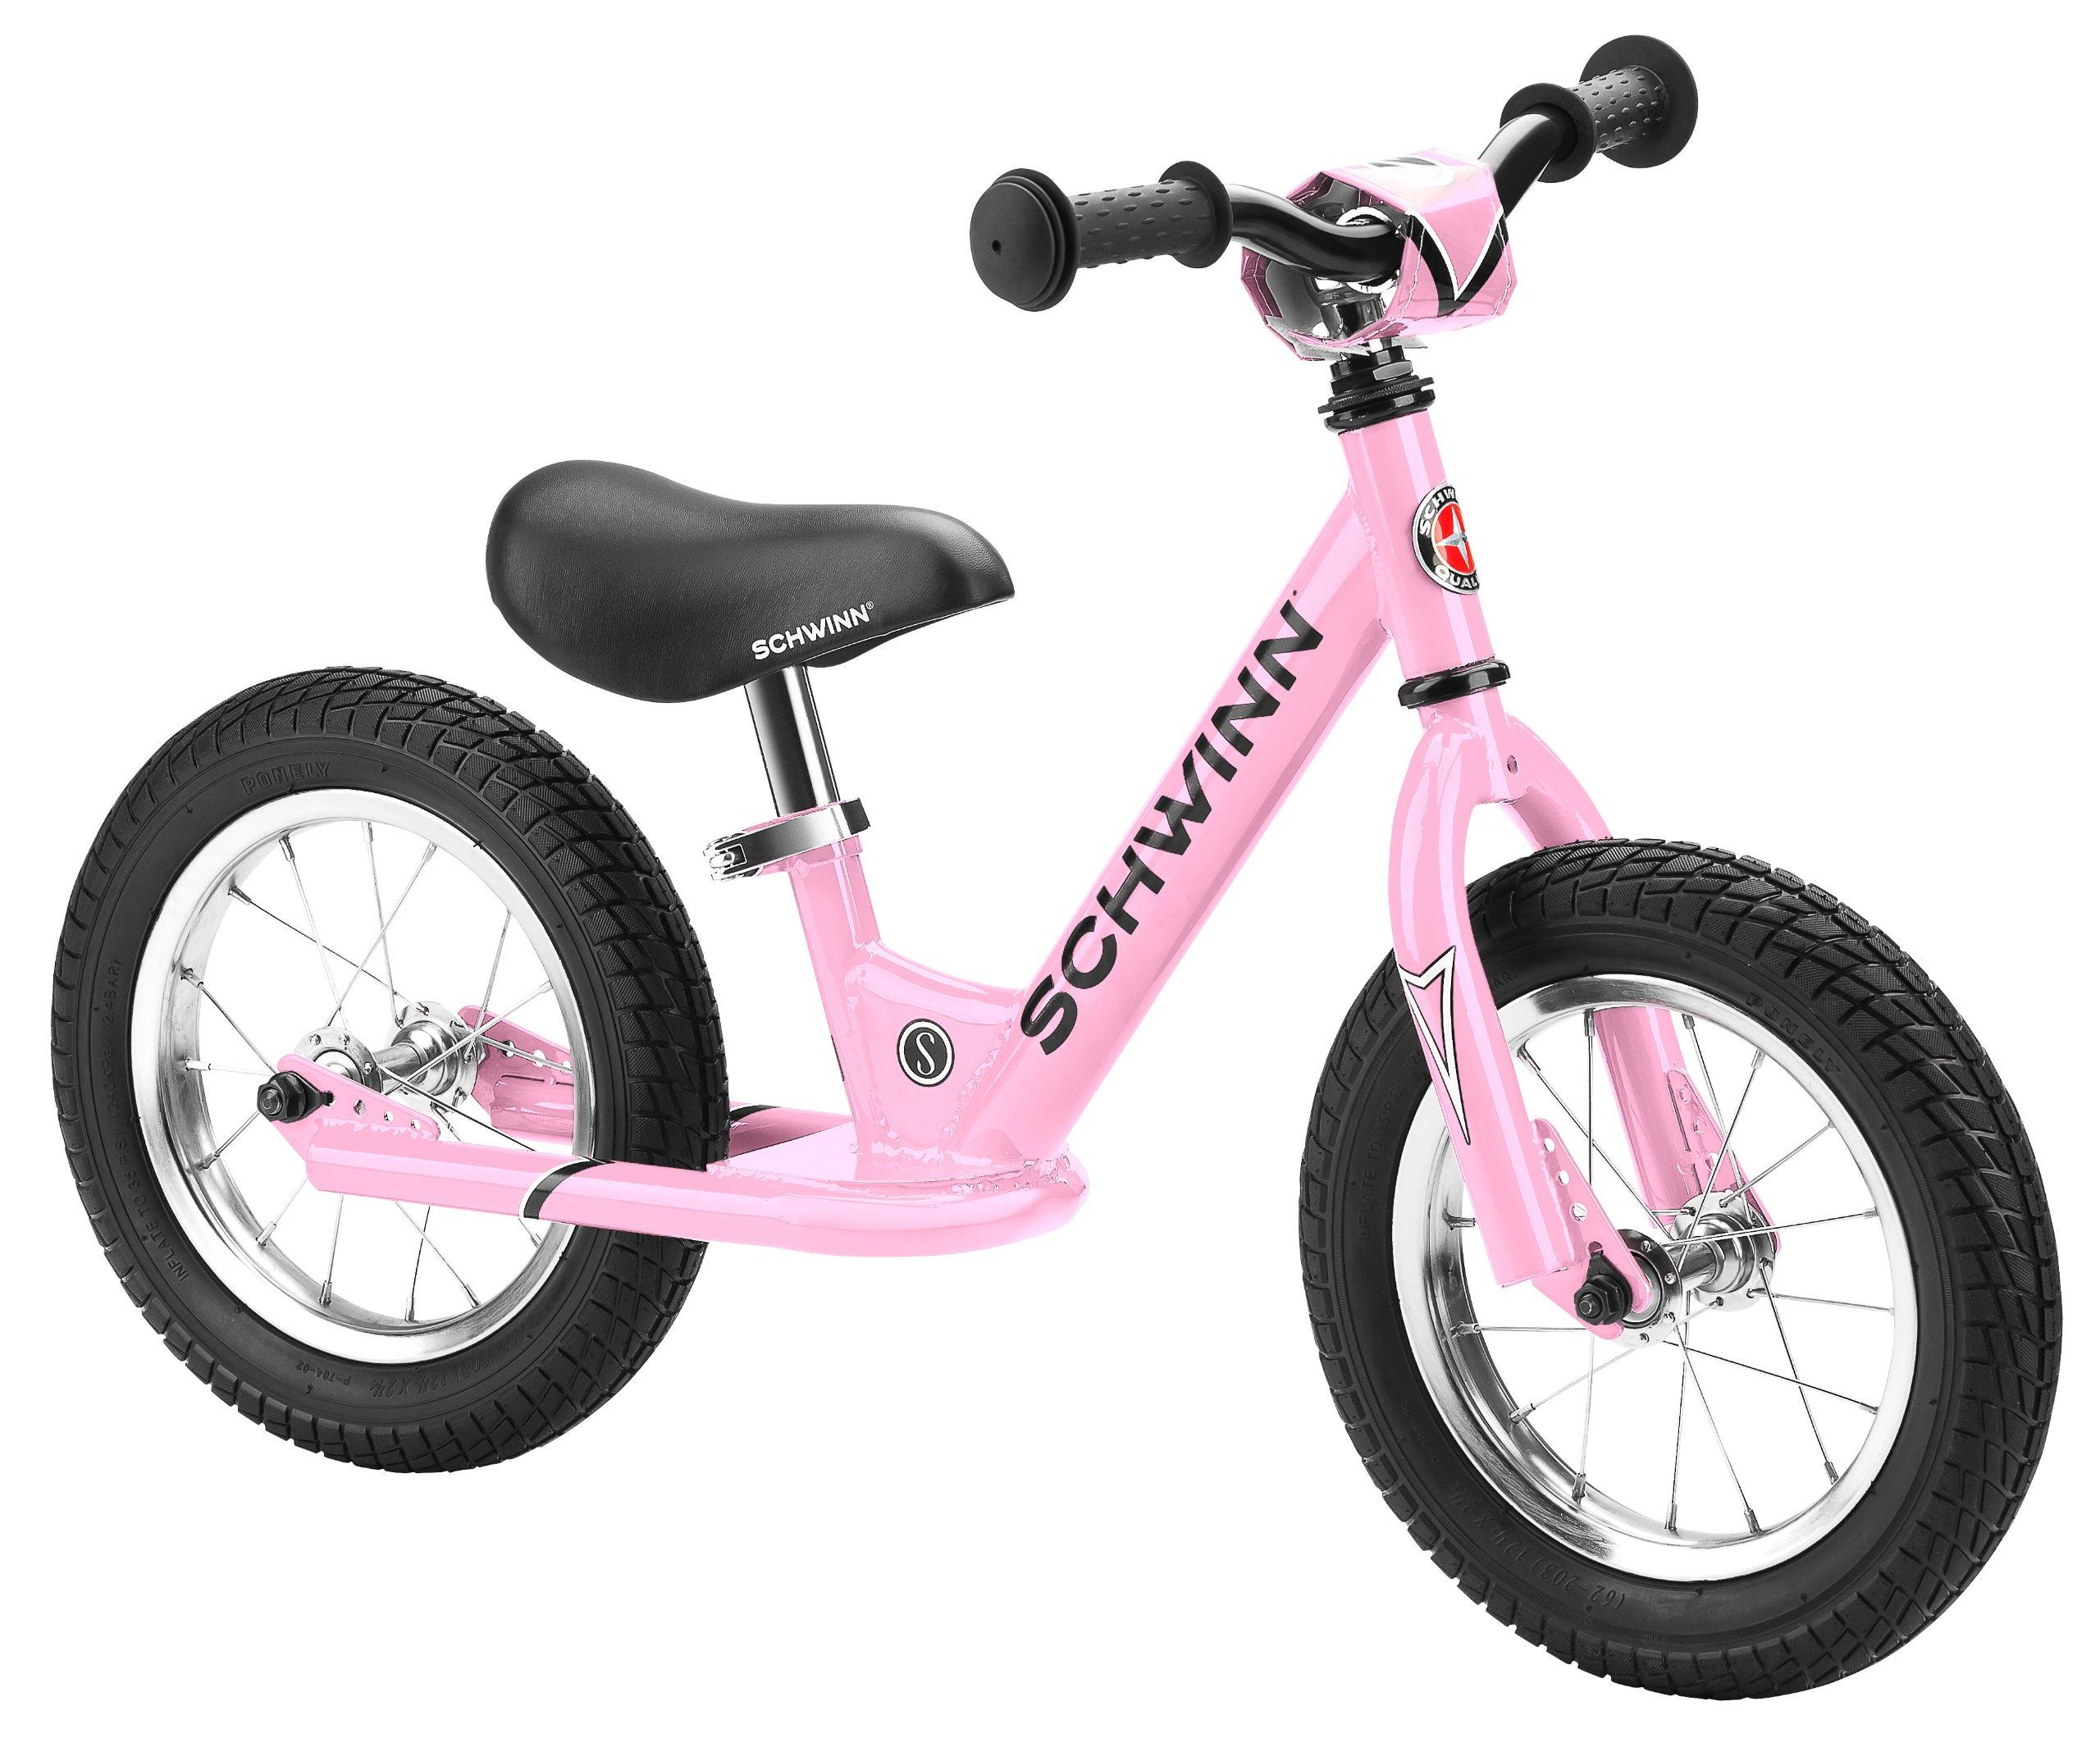 Schwinn Balance Bike, 12 inch wheel size, stride bike Ages 2-4 Pink